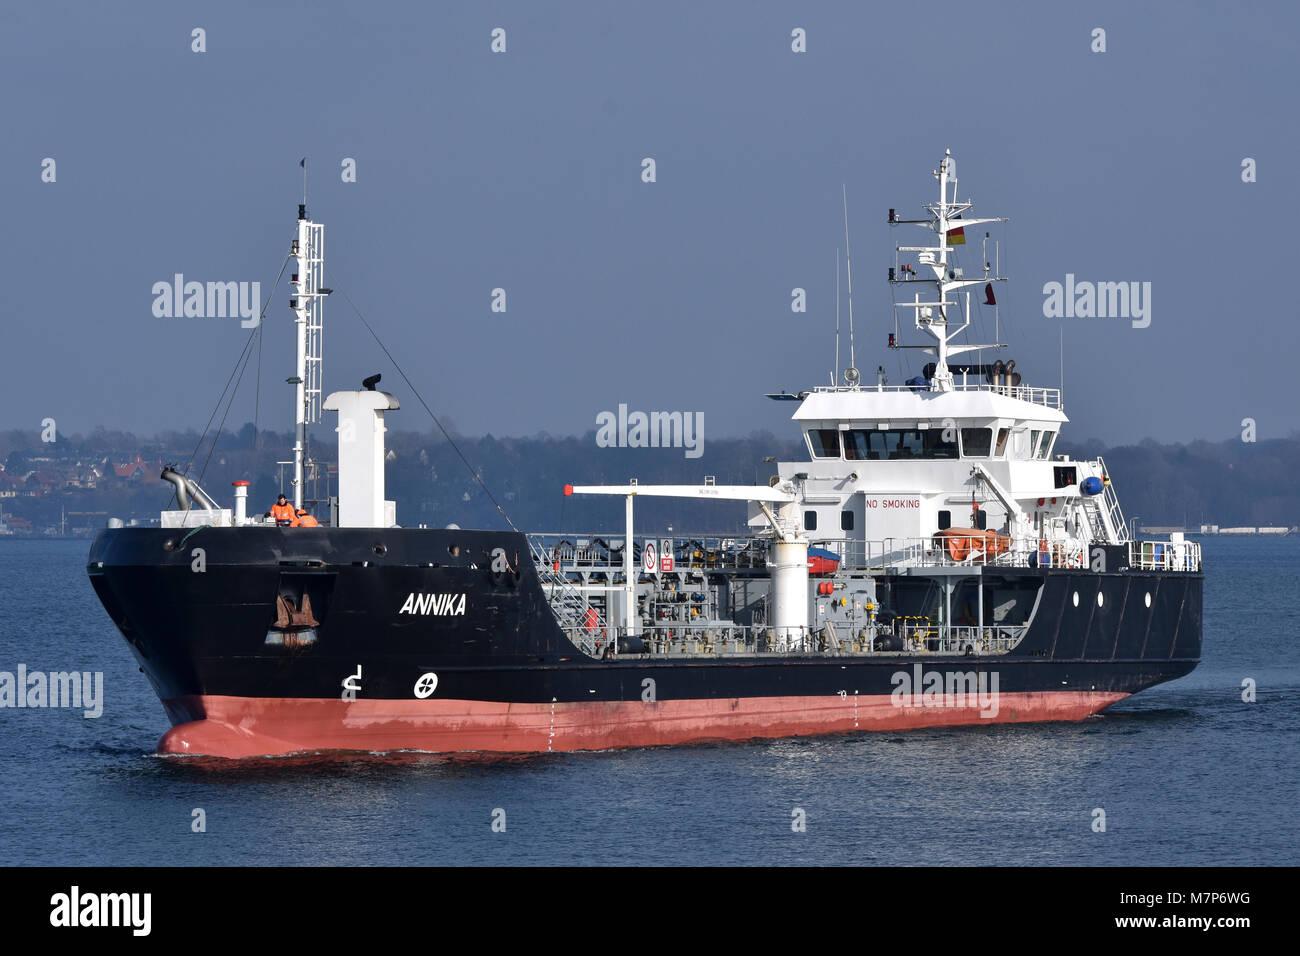 Tanker Annika entering Holtenau Locks at the Kiel Canal - Stock Image